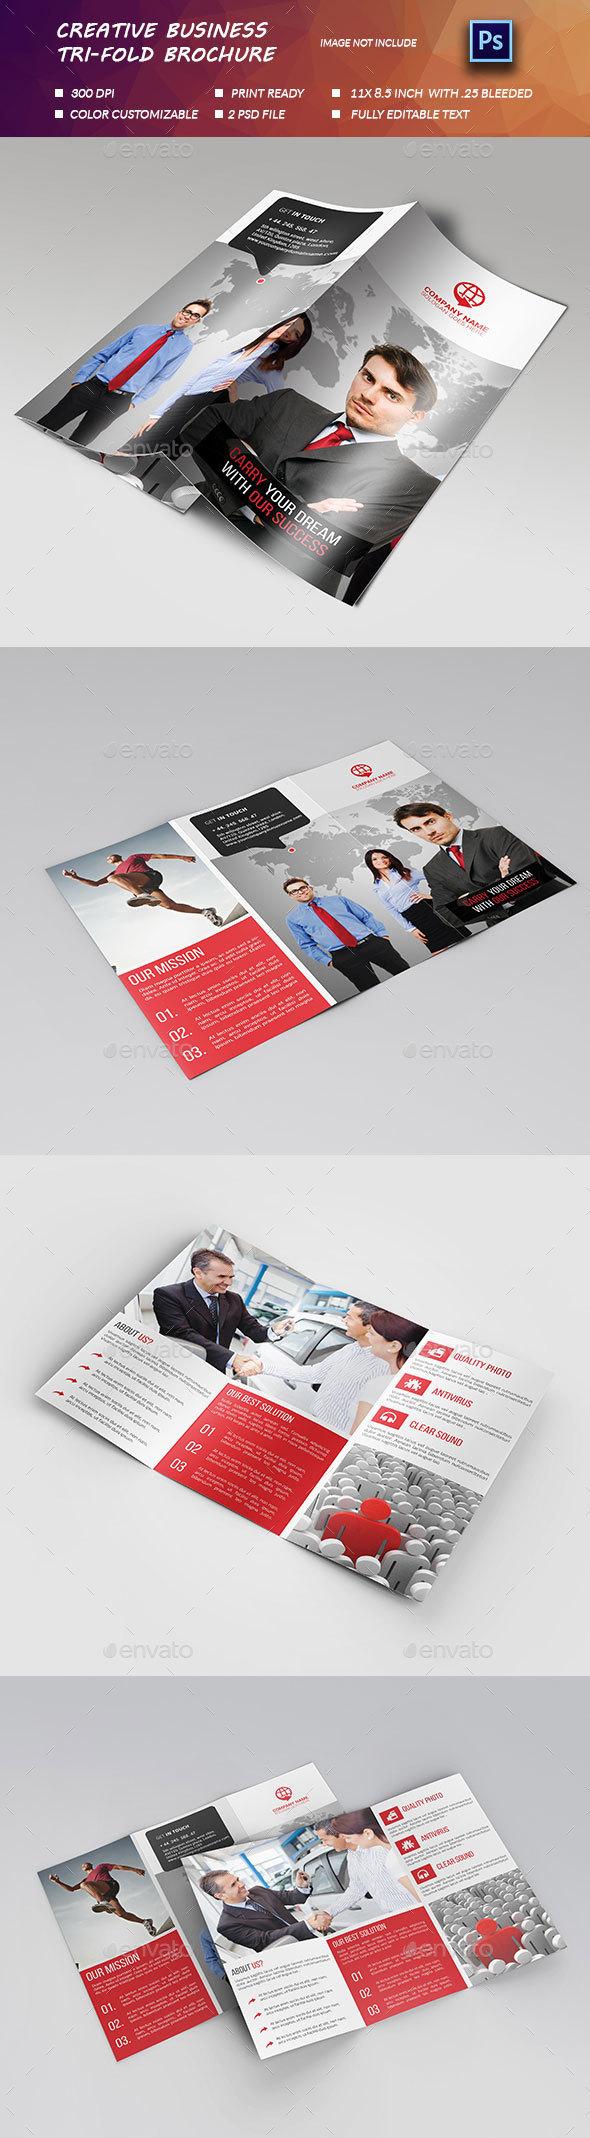 Creative Business Tri-fold Brochure. - Brochures Print Templates